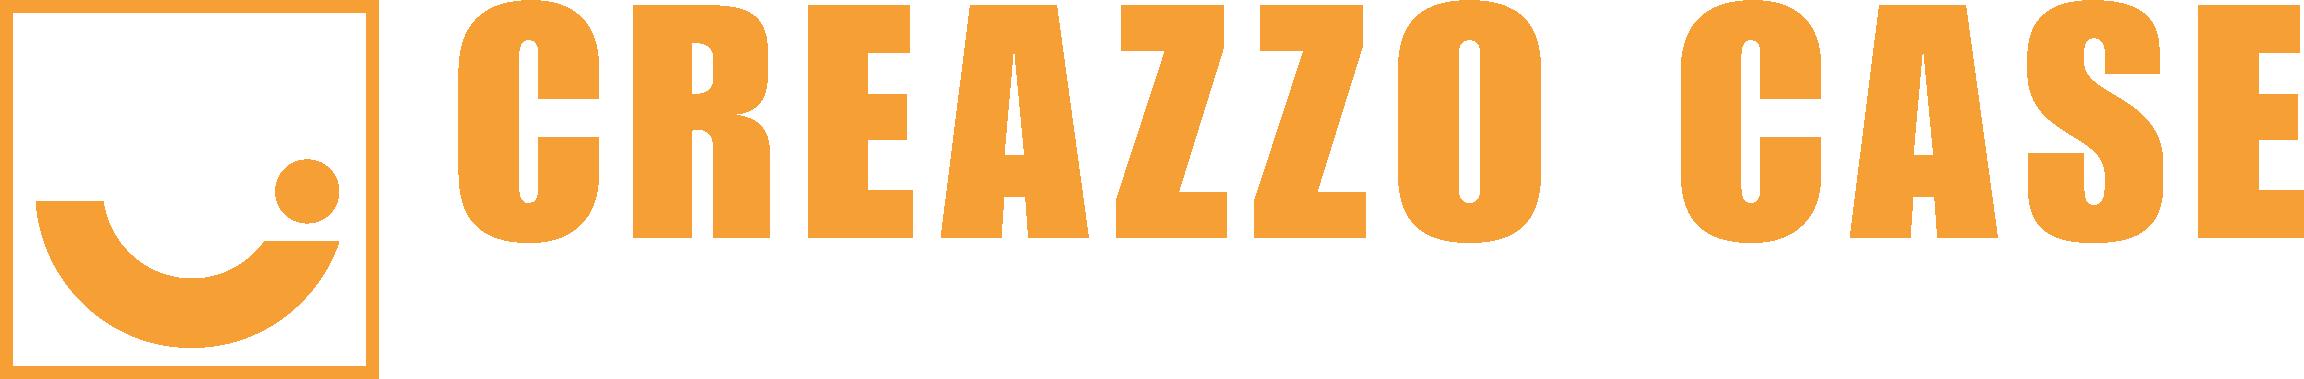 Creazzo Case